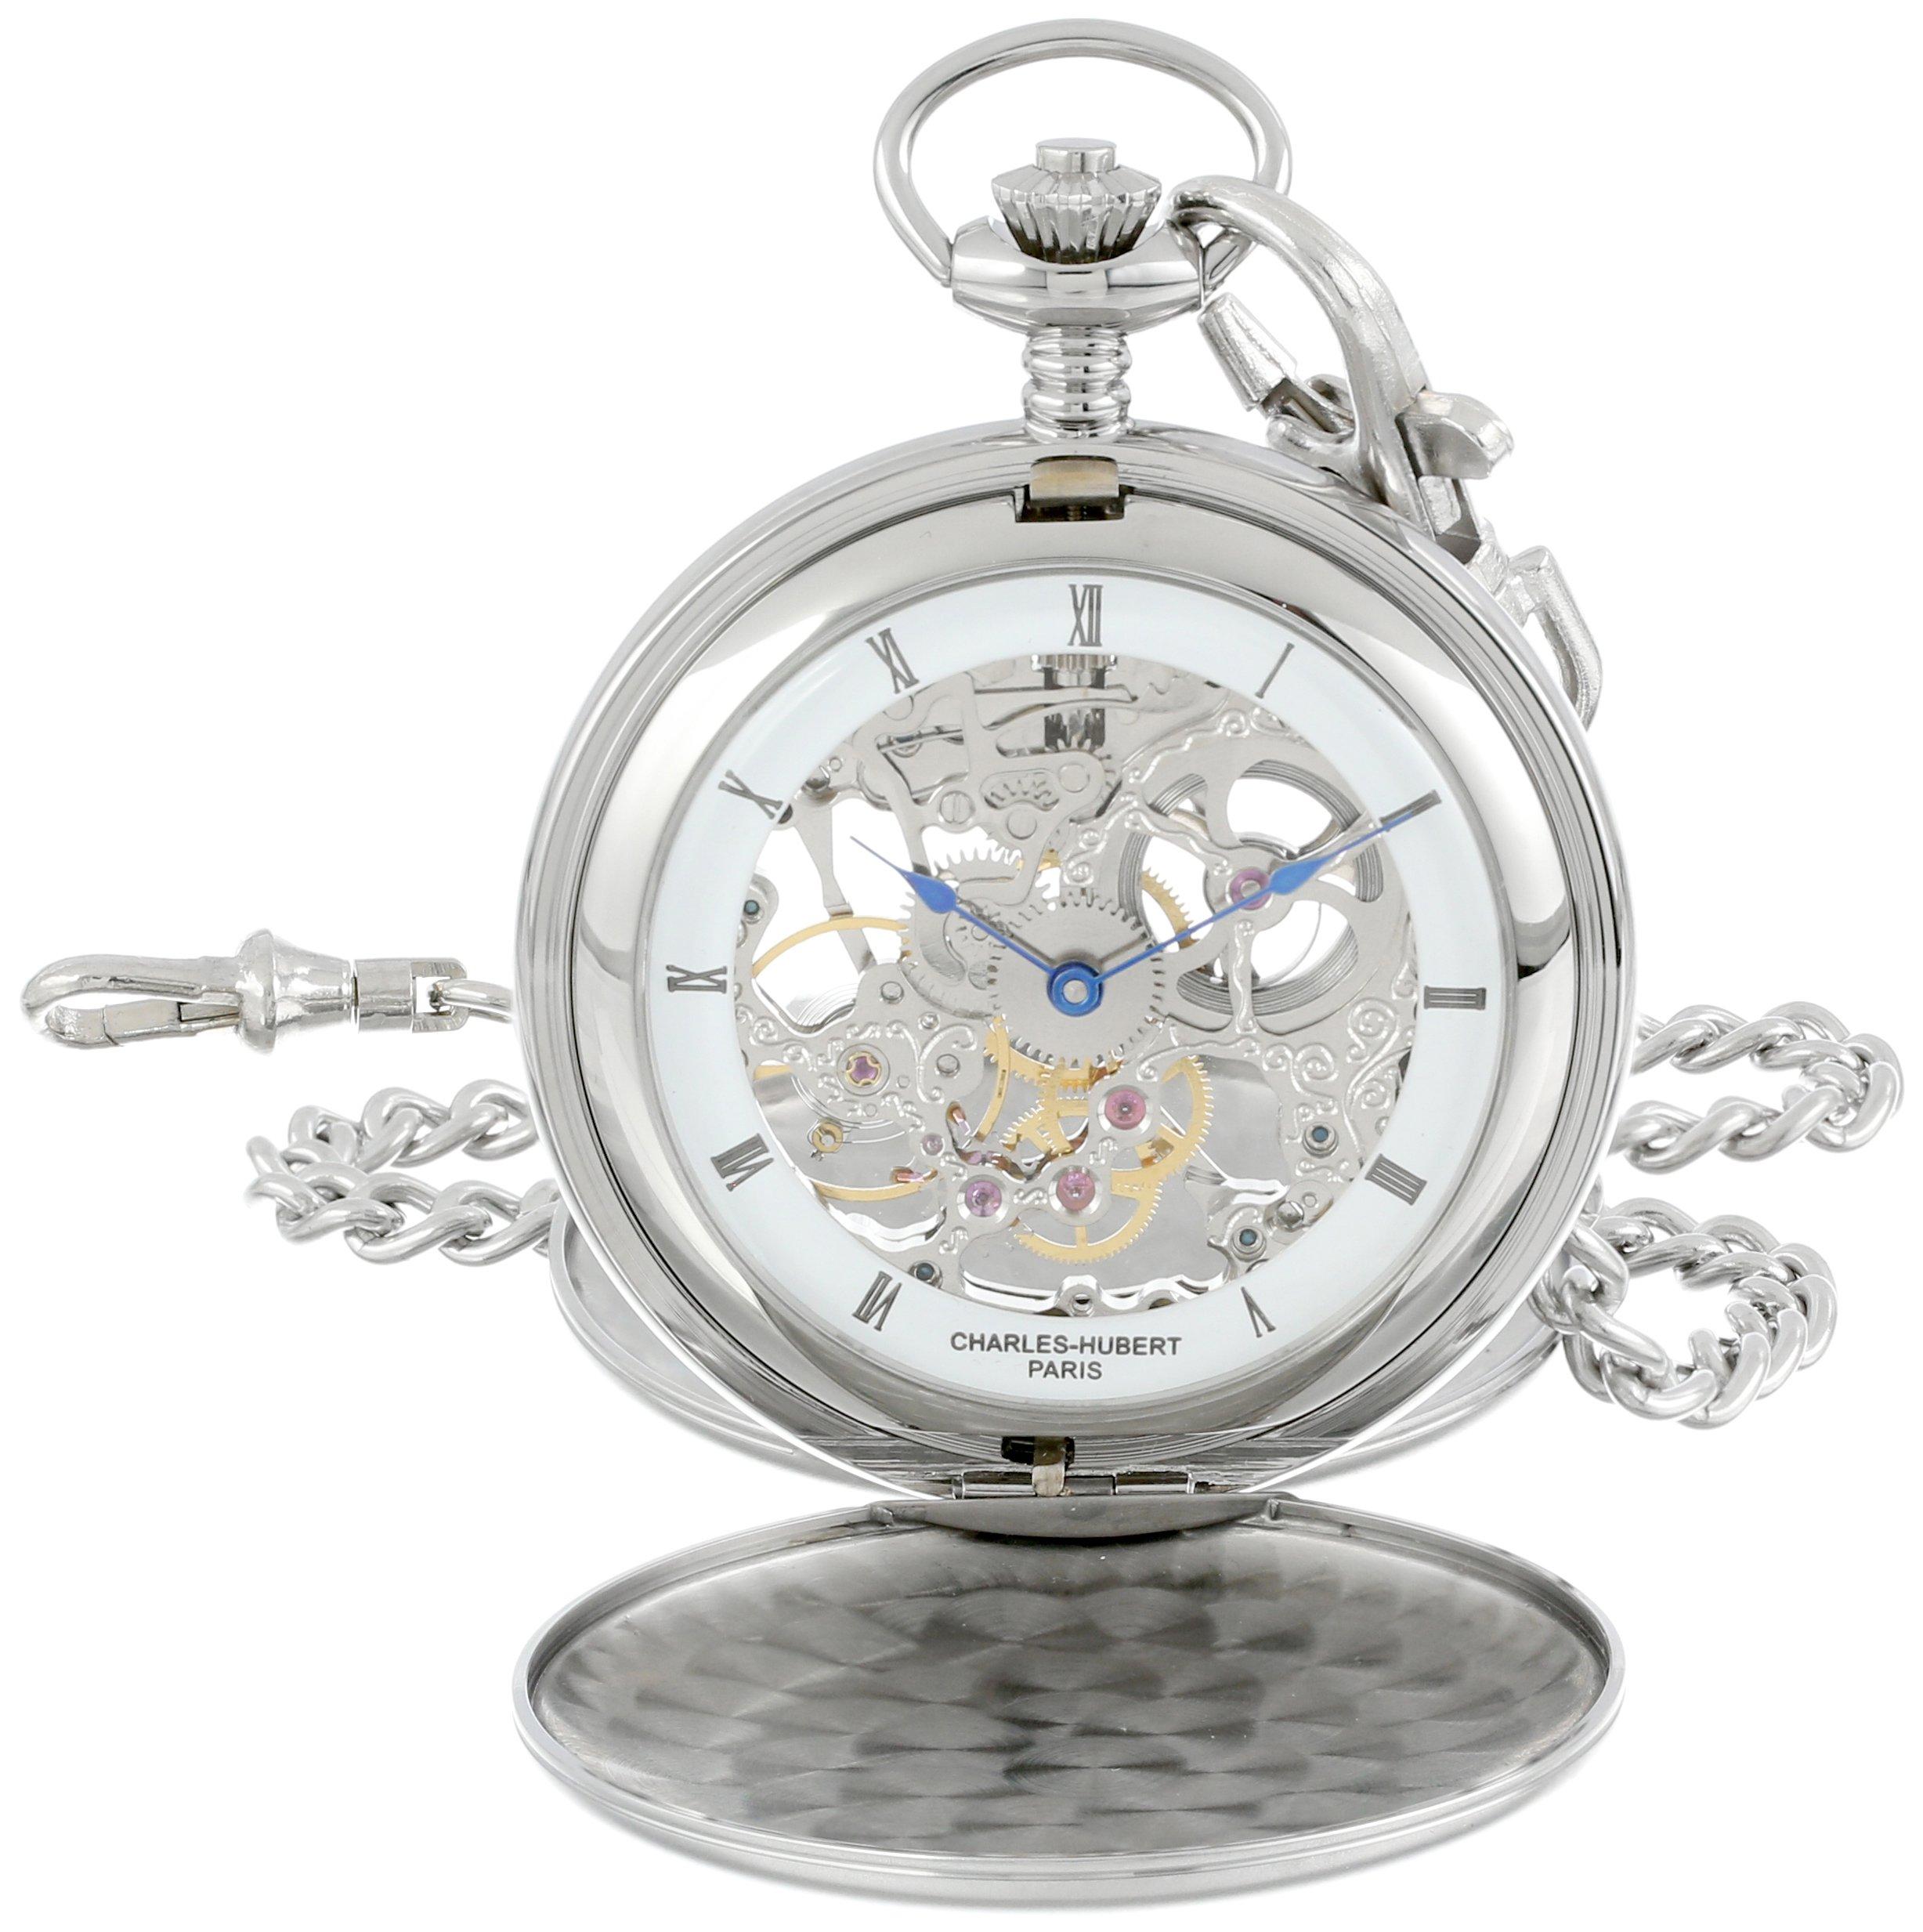 Charles-Hubert, Paris 3780-W Mechanical Pocket Watch